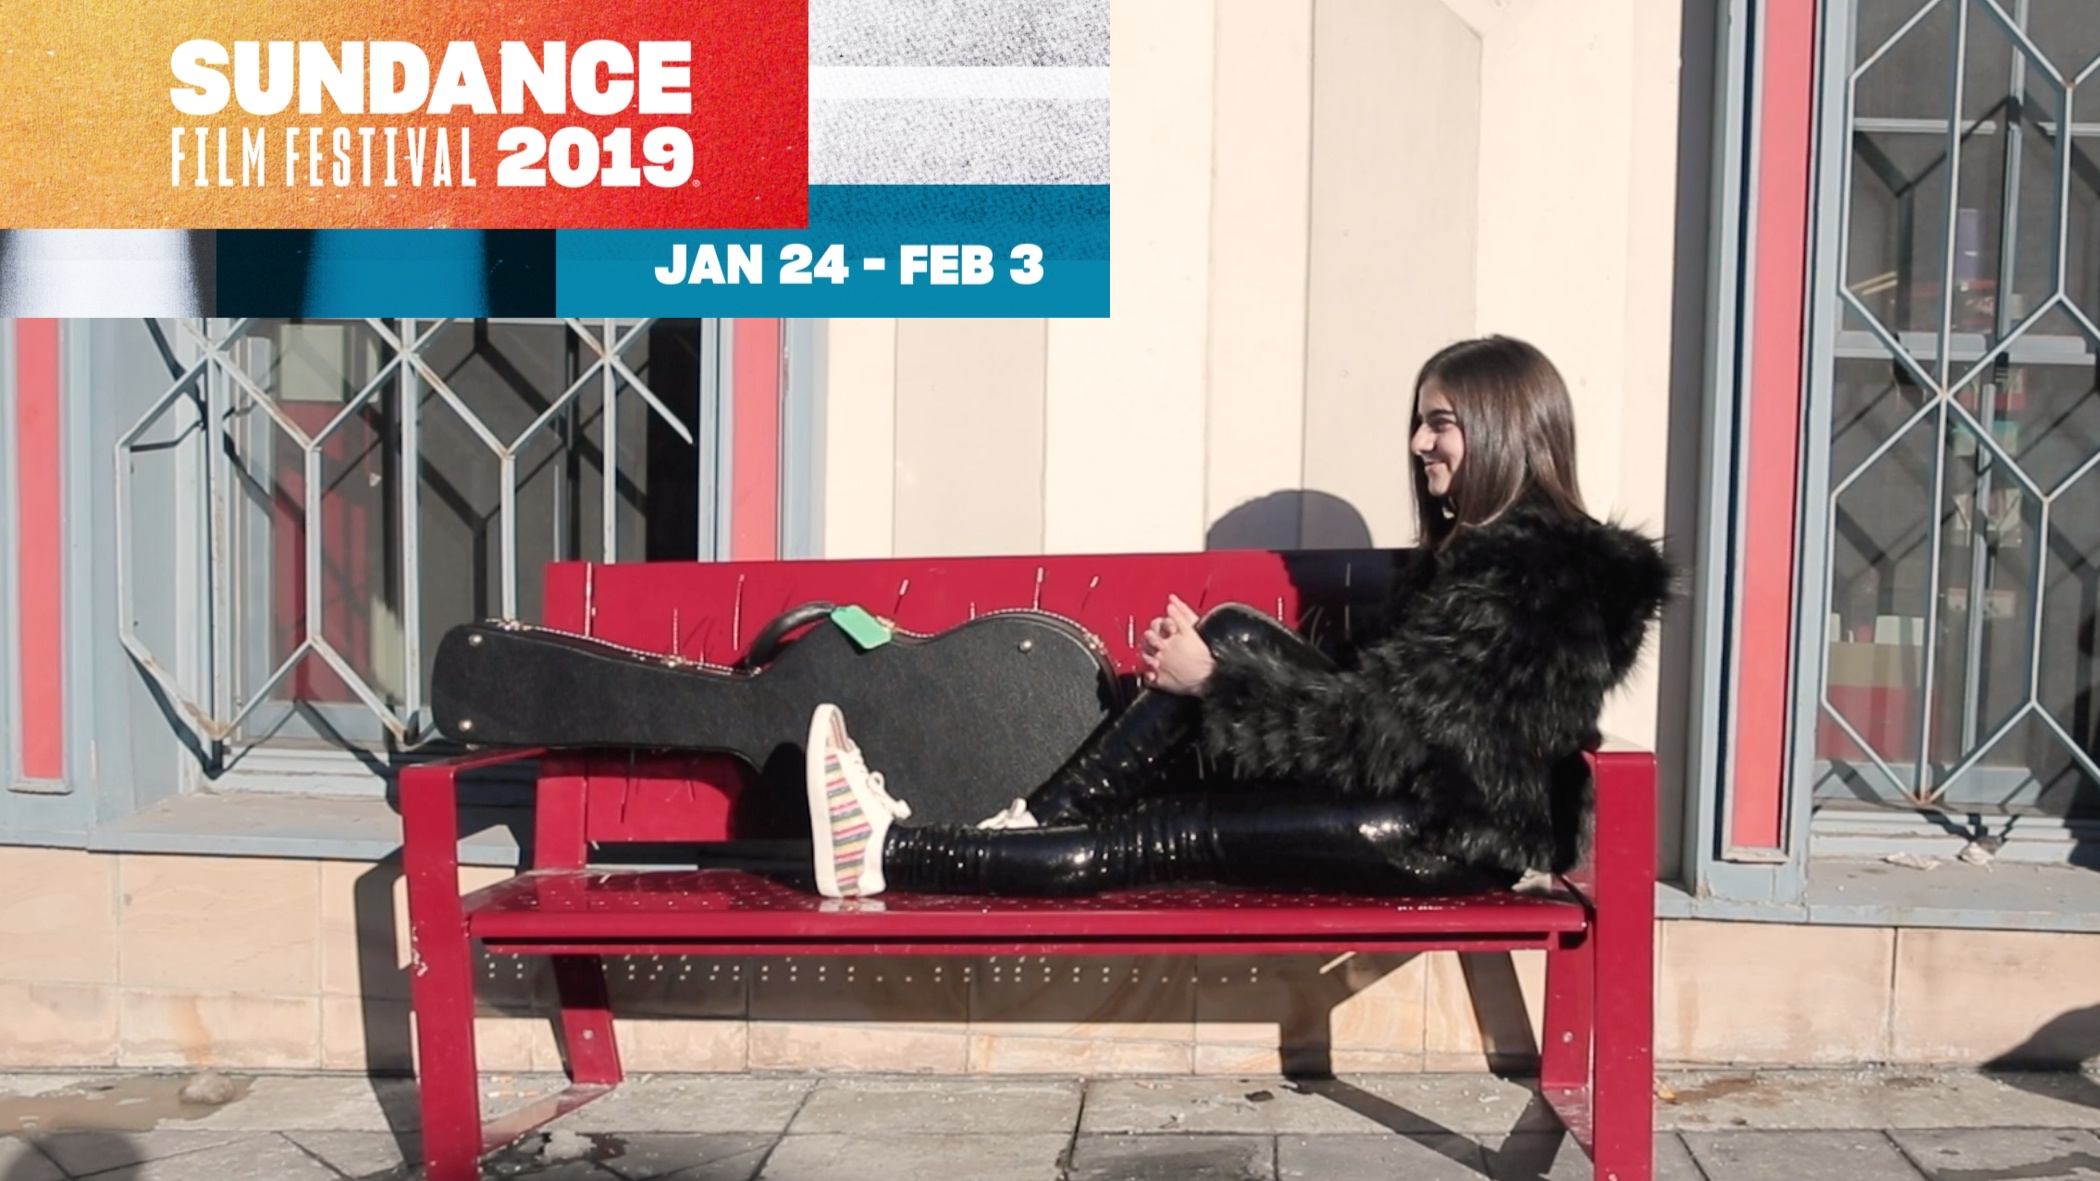 Sundance+Ava+on+Bench+LOGO.jpg